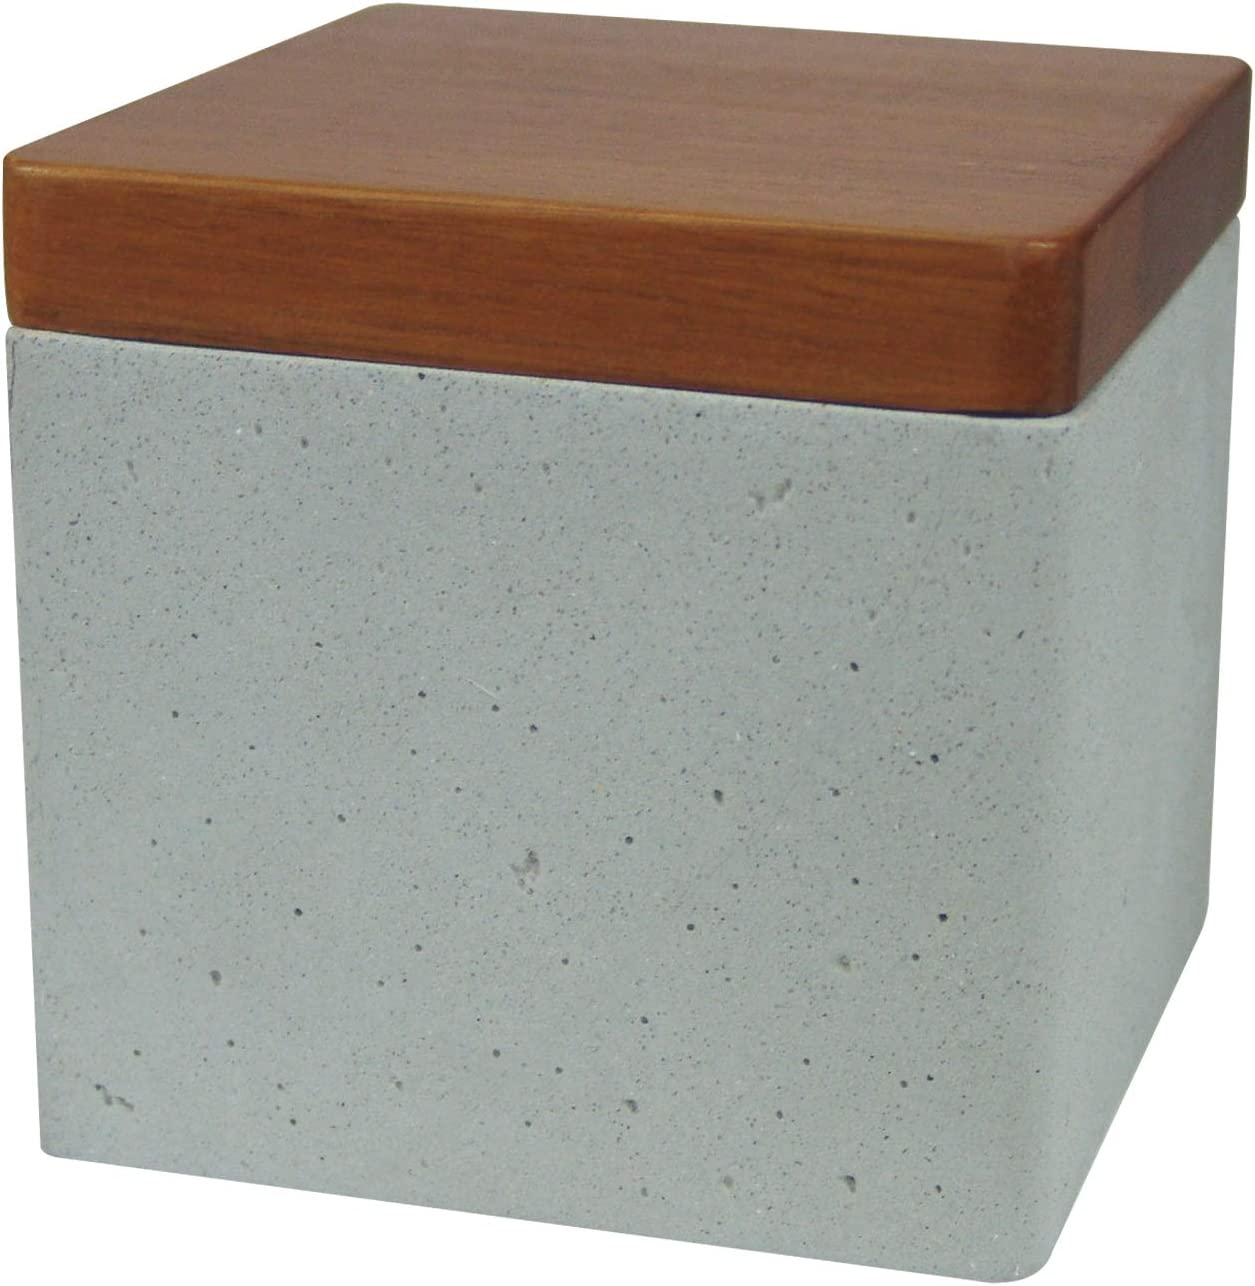 nu steel Nusteel Concrete, Made of Cement Bathroom Vanity Countertop Storage Organizer Canister Jar for Cotton Swabs, Rounds, Balls, Makeup Sponges, Bath Salts, Grey Stone/Brown